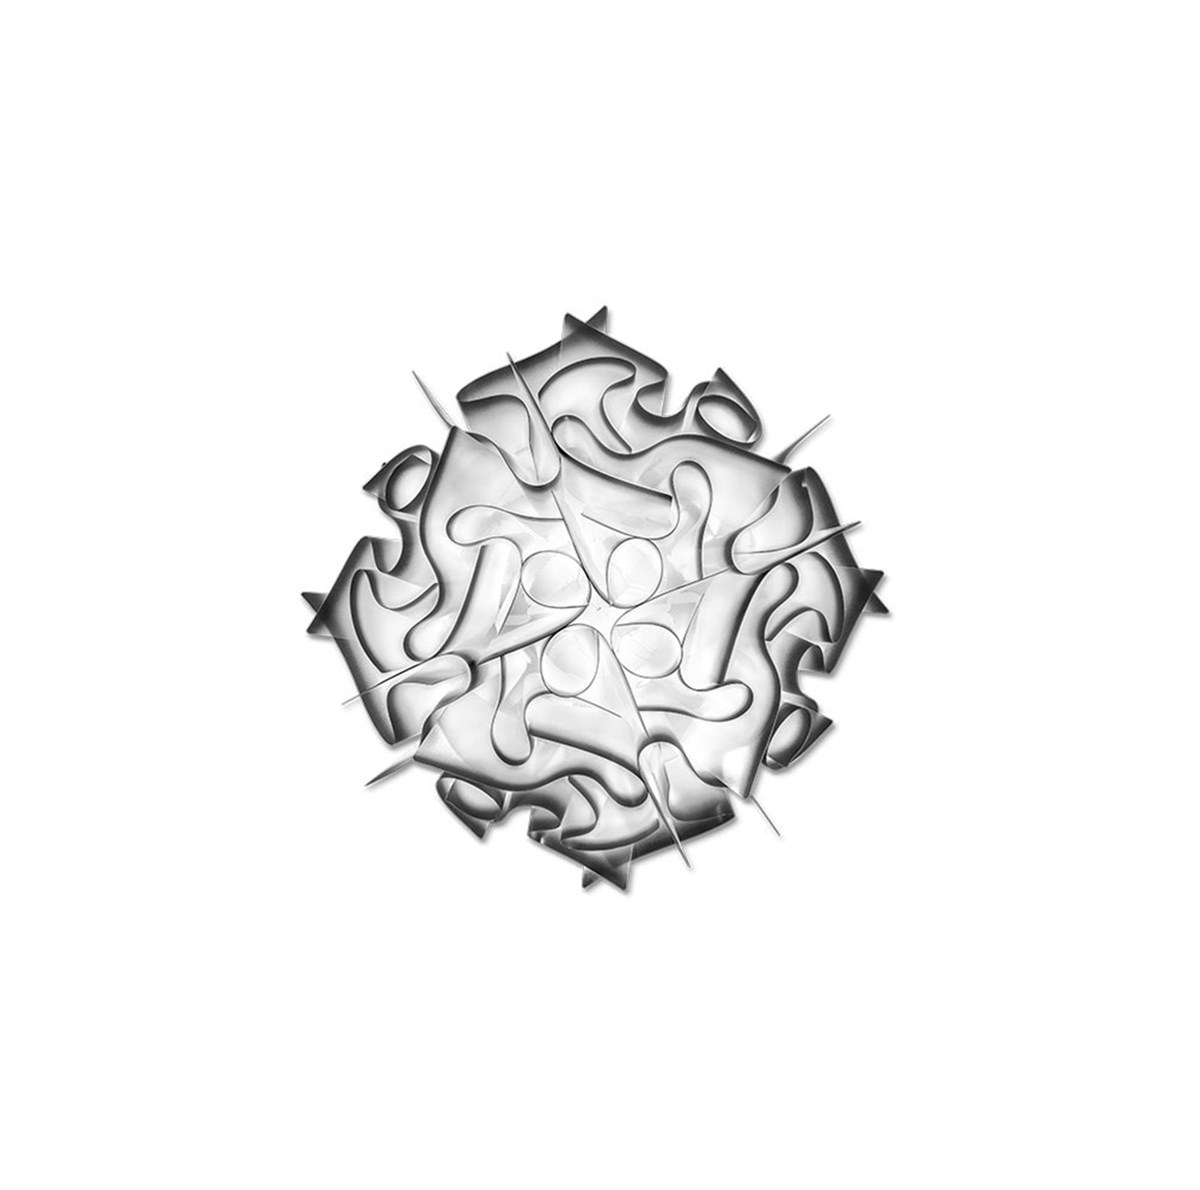 Slamp-Adriano-Rachele-Veli-Ceiling-Charcoal-Matisse-1